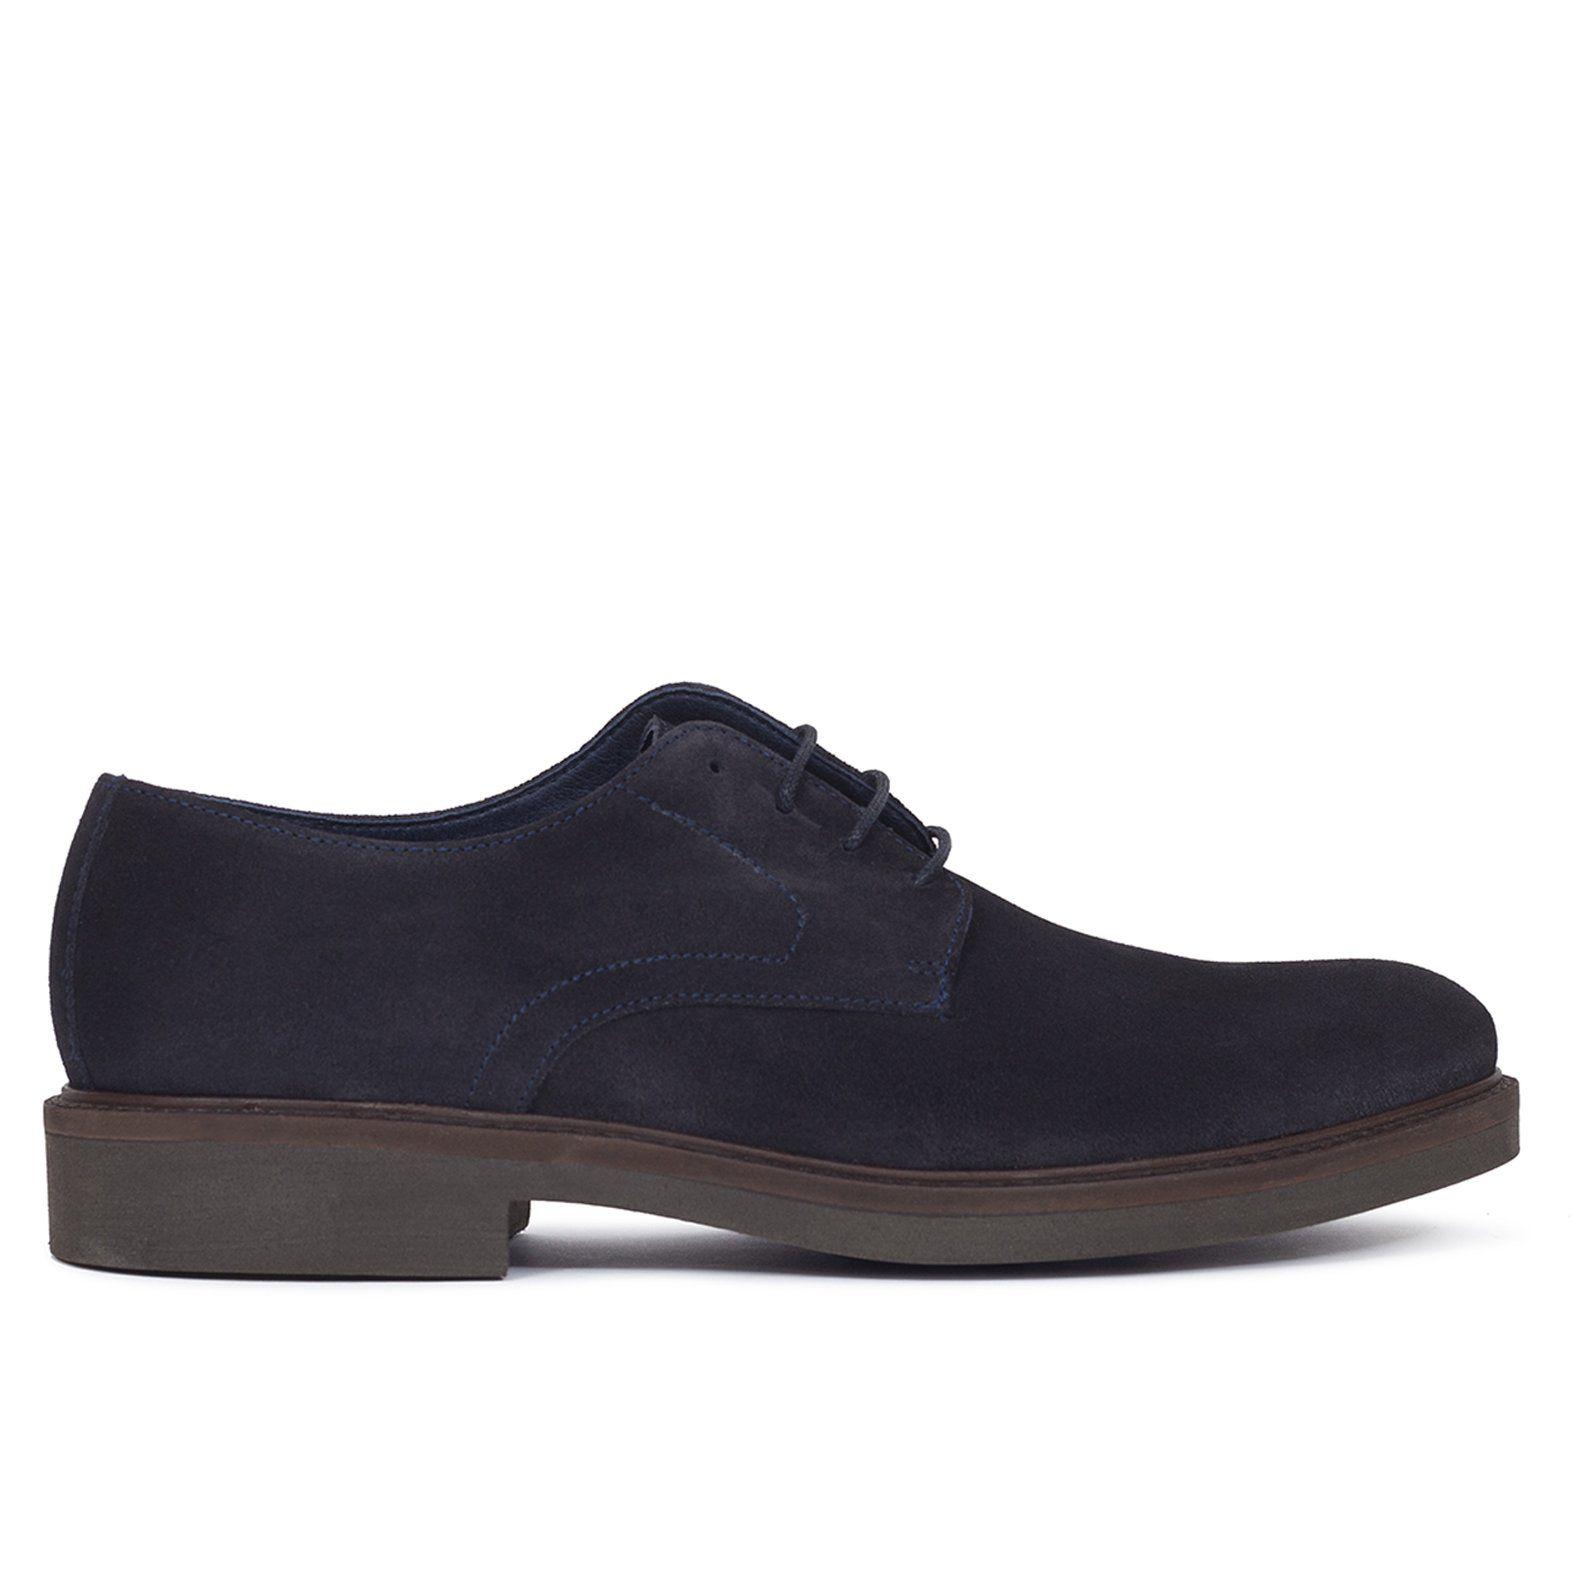 5da216add0b1e Zapato de hombre con ordones de piel MARINO - Zapatos online miMaO – miMaO  ShopOnline